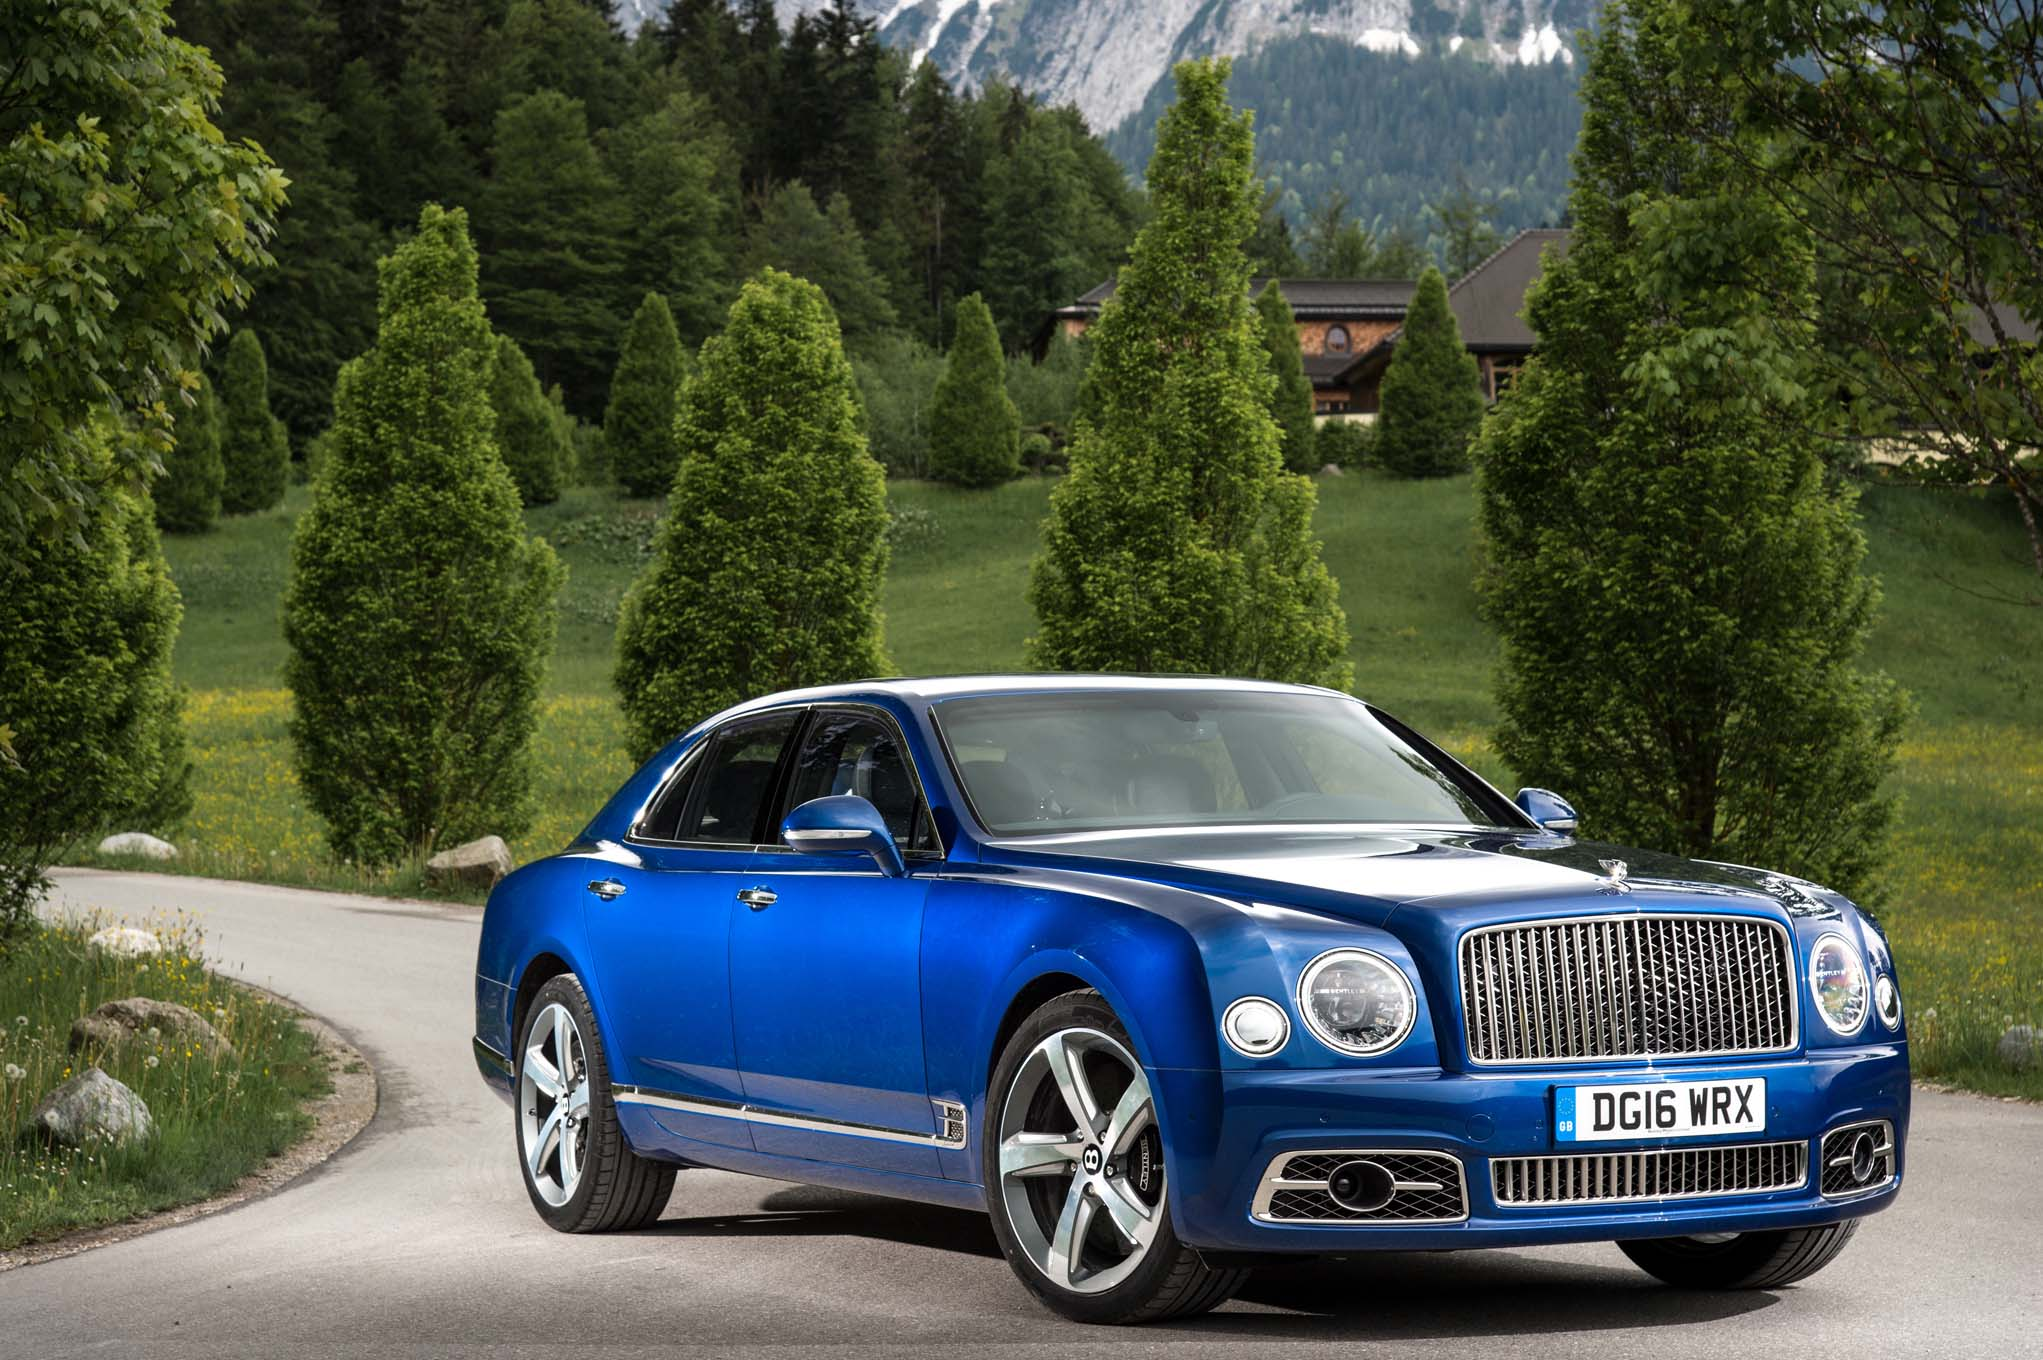 2017 Alfa Romeo Giulia Msrp >> Bentley Mulsanne Grand Limousine Is an Ultra-Lux, Six ...